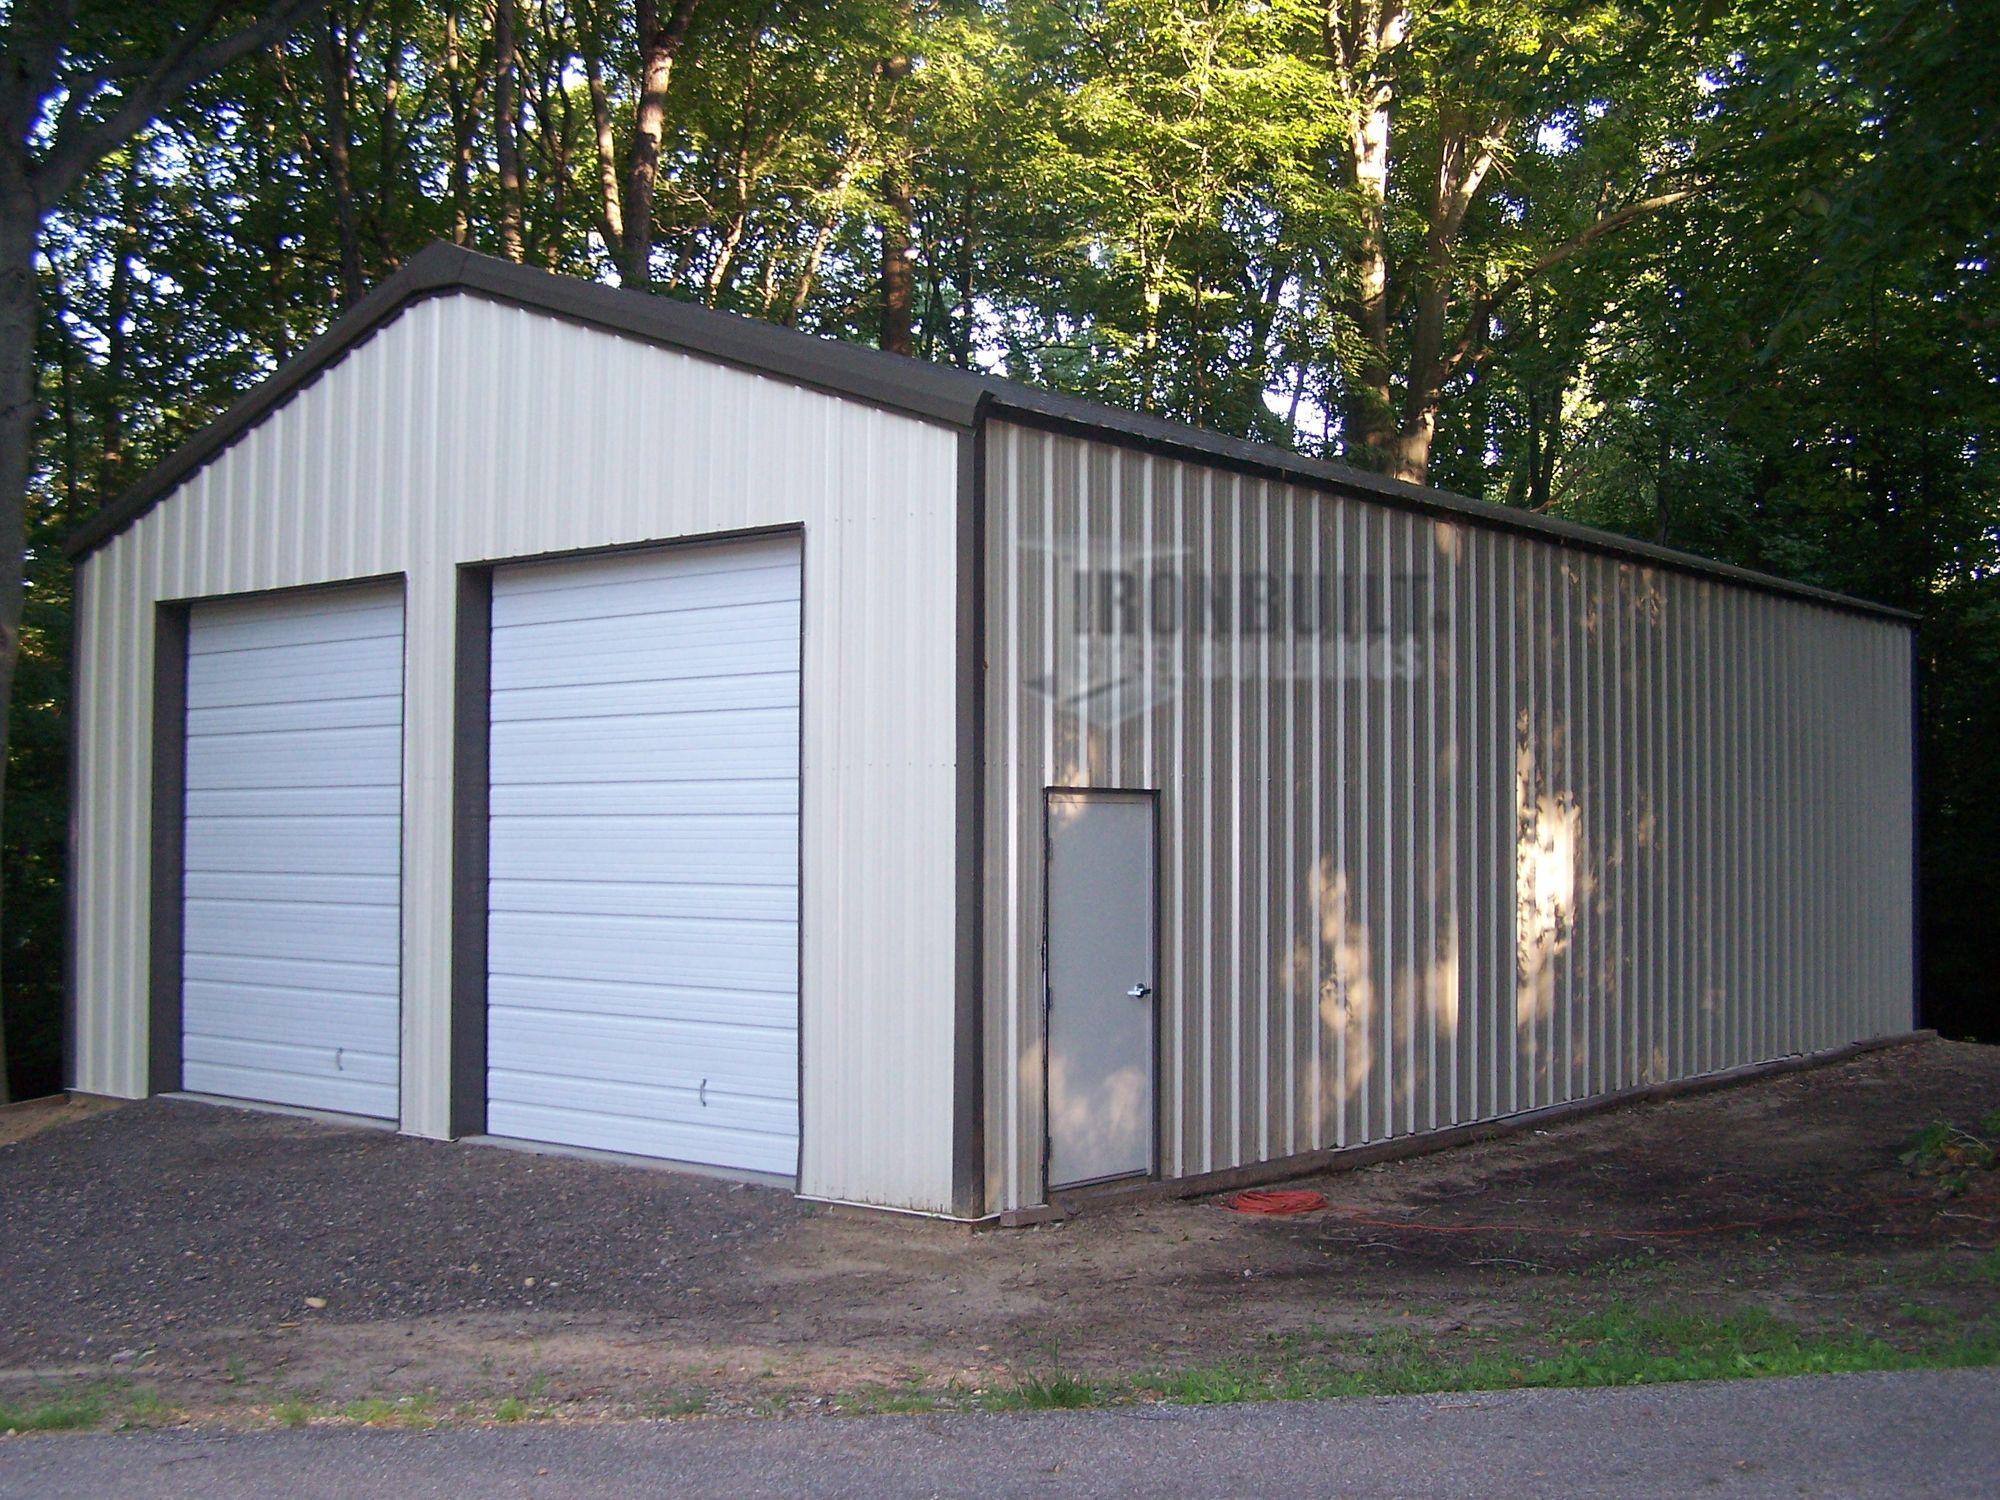 Strong Prefab Steel Garages Steel garage, Prefab metal